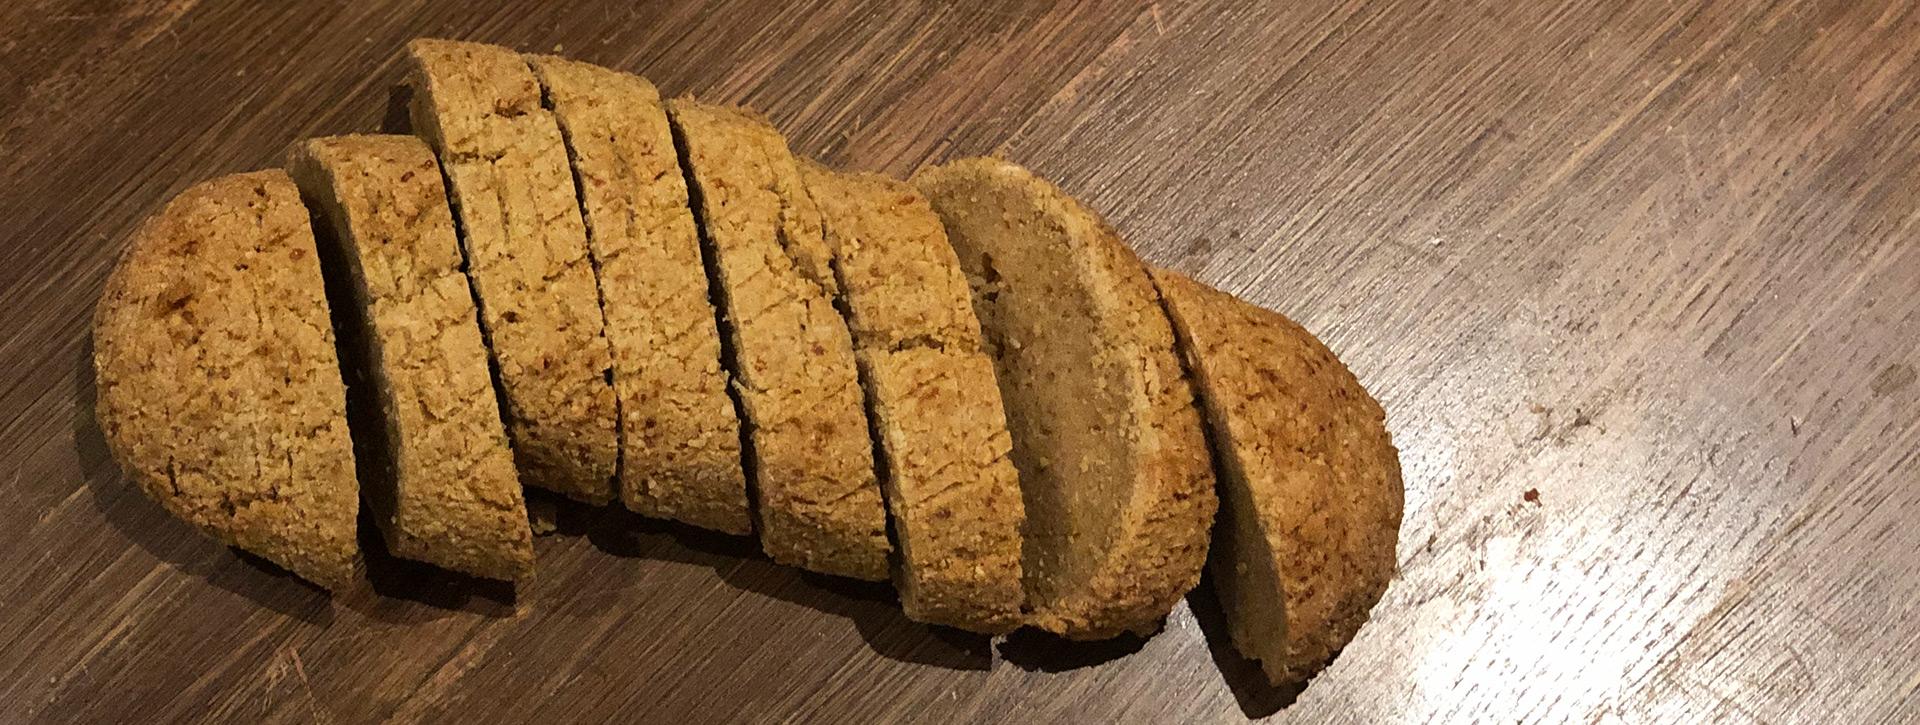 Energizing Paleo Bread (AIP)